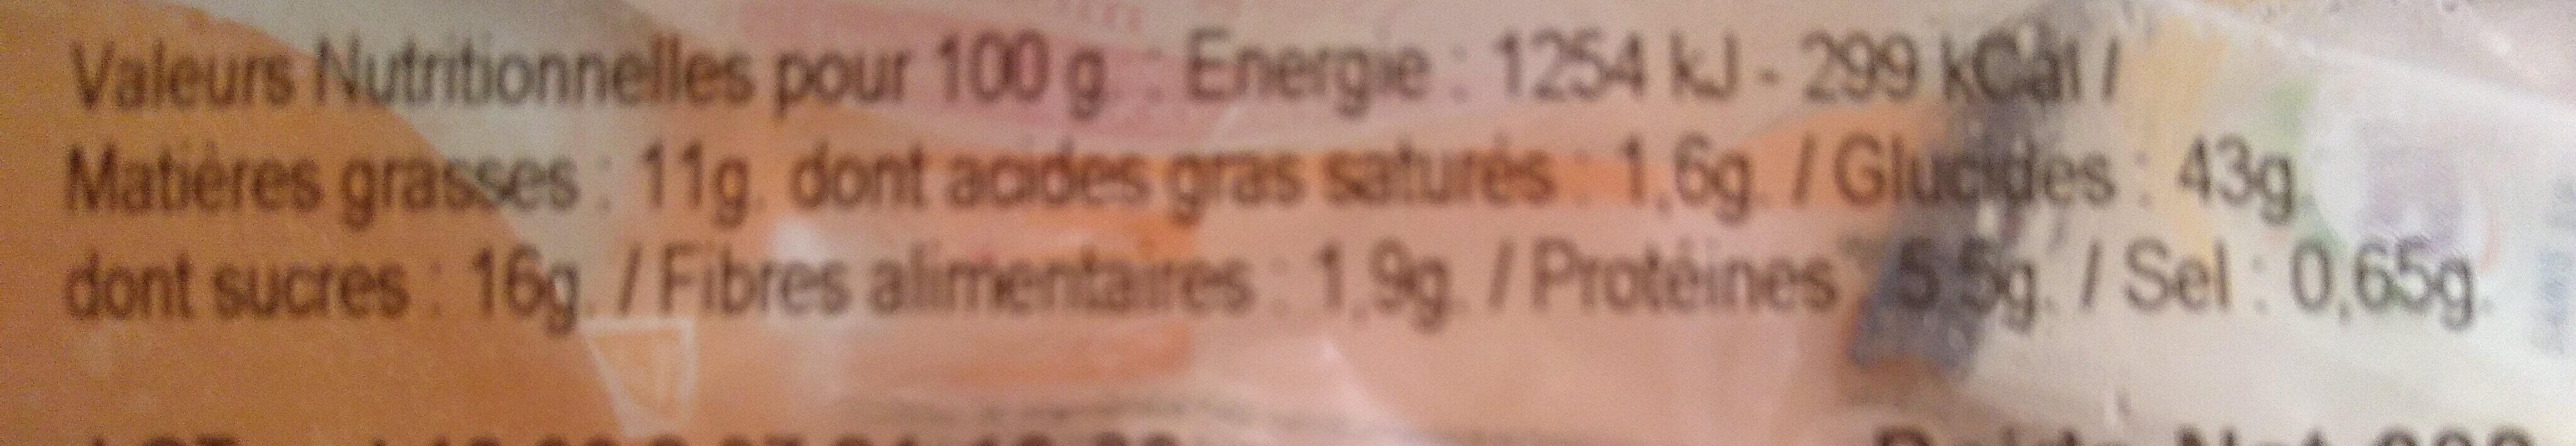 Beignets framboise X 10 - Informations nutritionnelles - fr